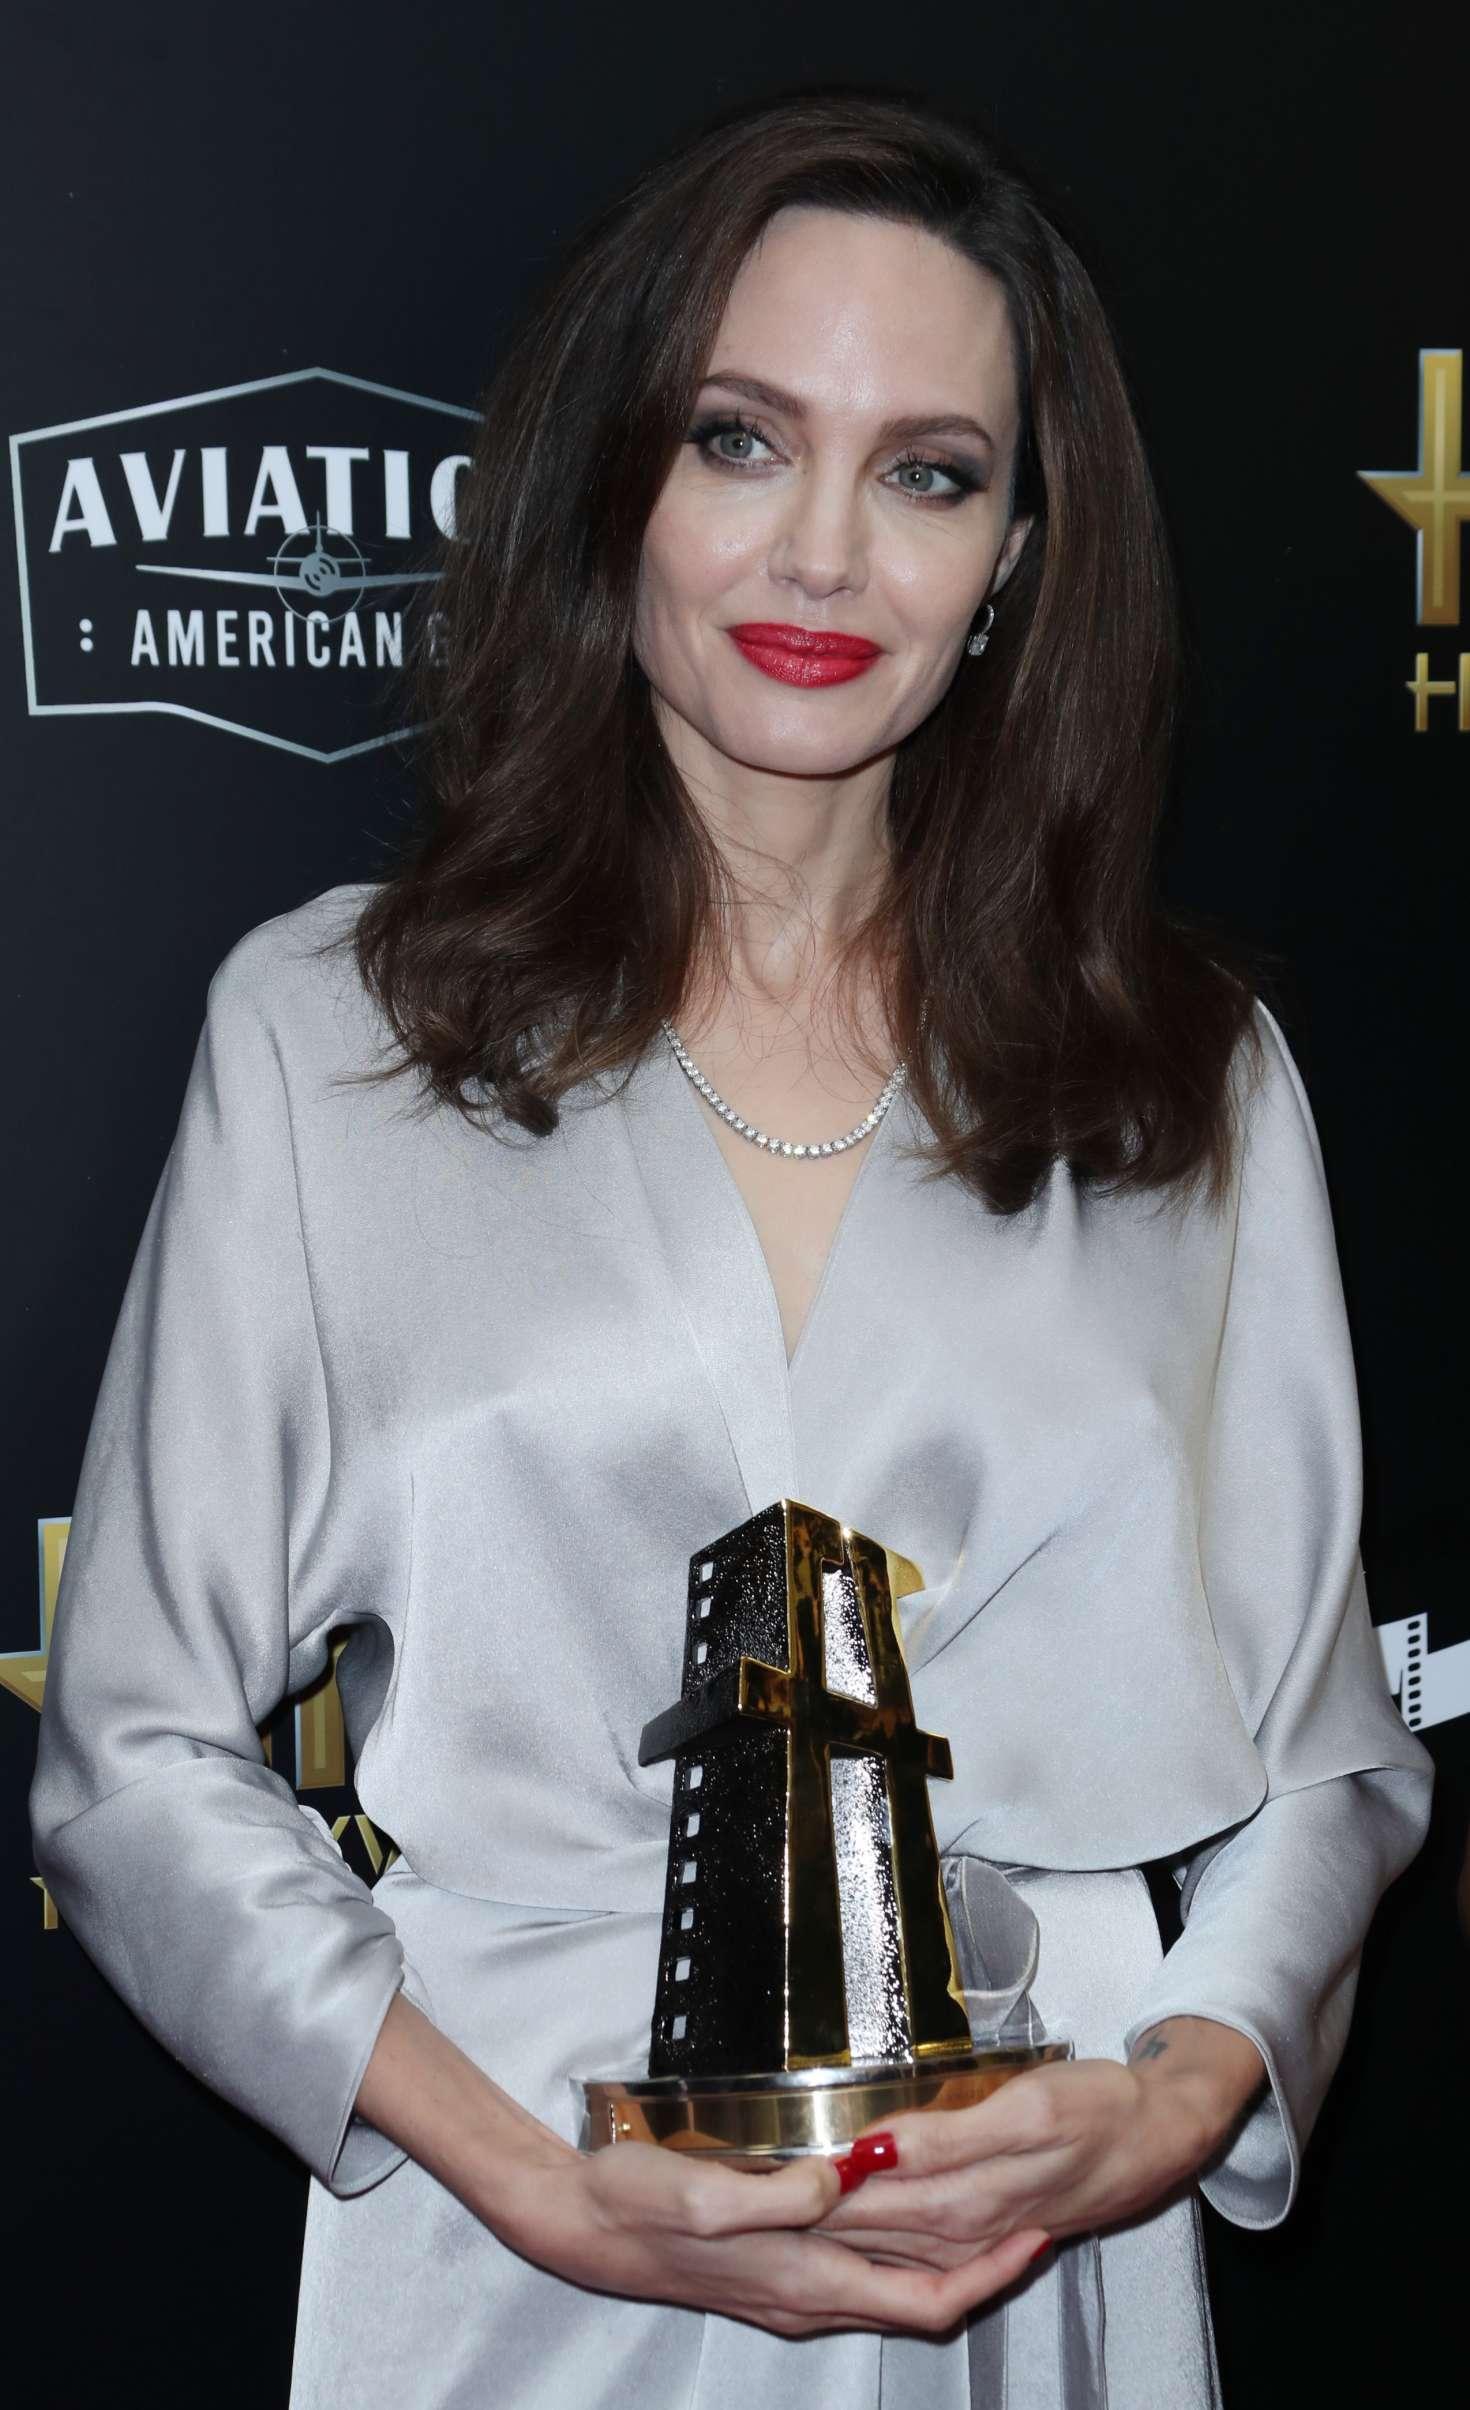 Angelina Jolie - Hollywood Film Awards 2017 in Los Angeles